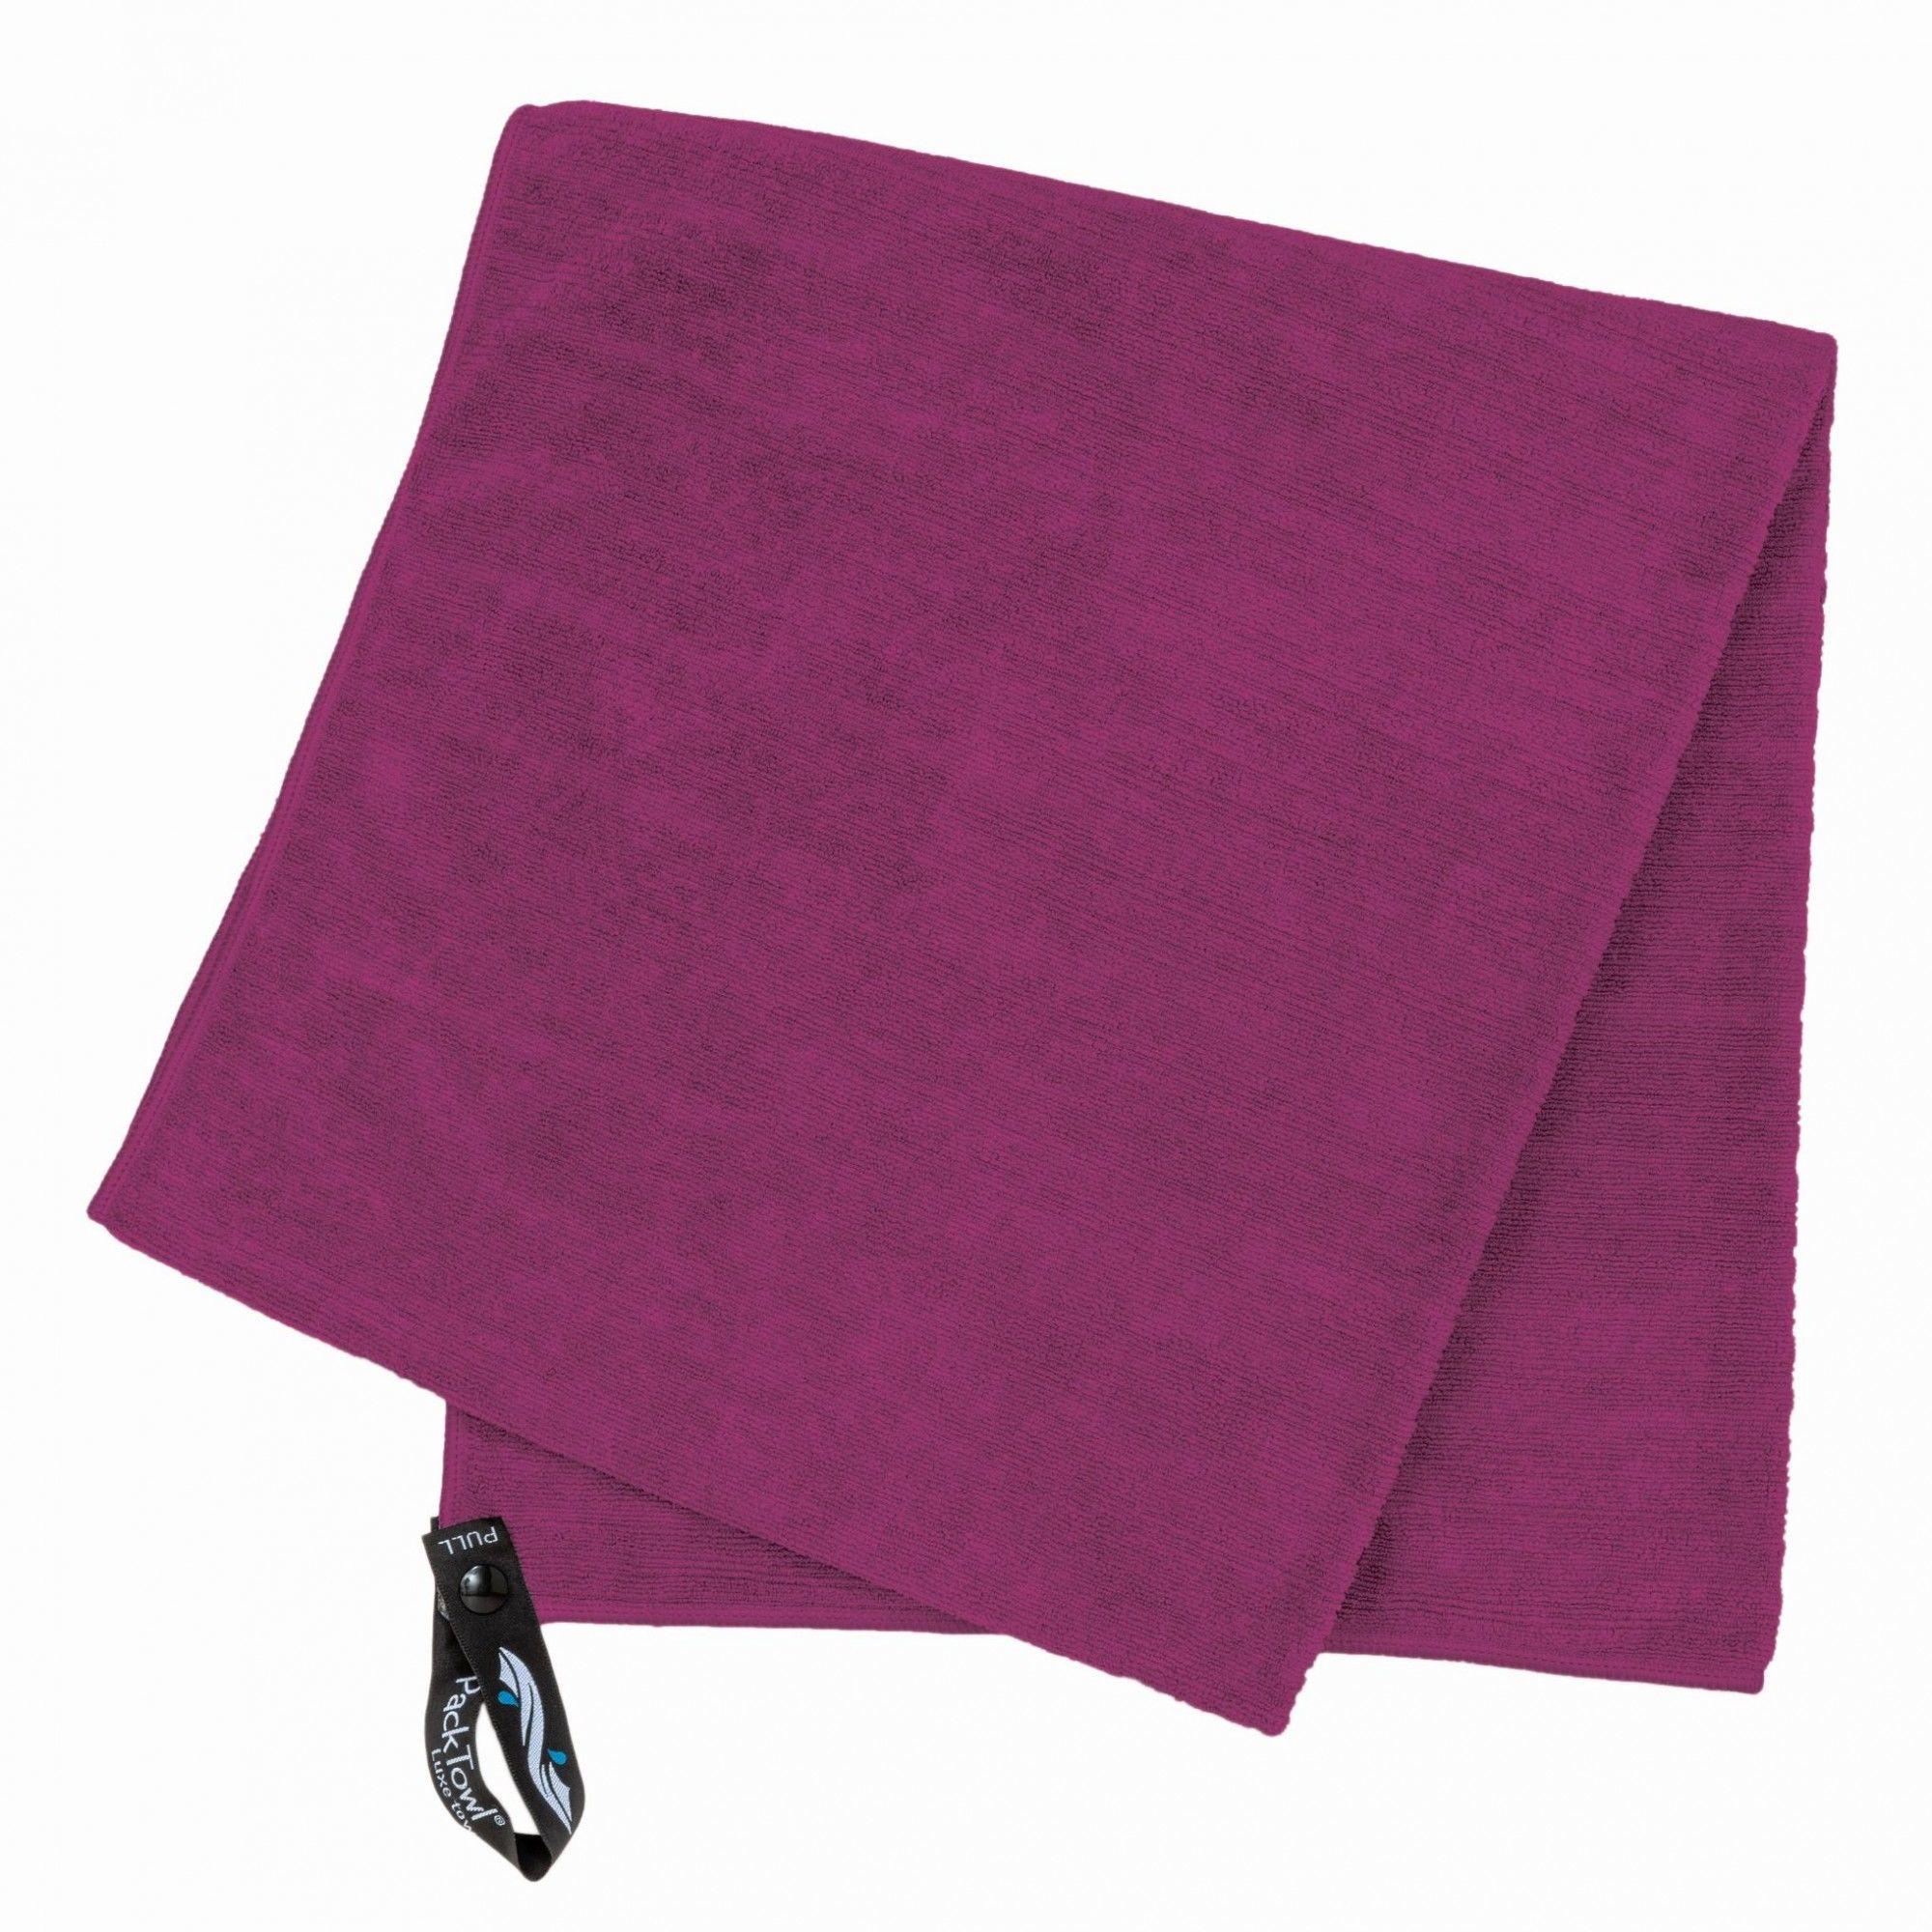 PackTowl Luxe XXL-Strand Lila/Violett, Outdoor-Hygiene, One Size